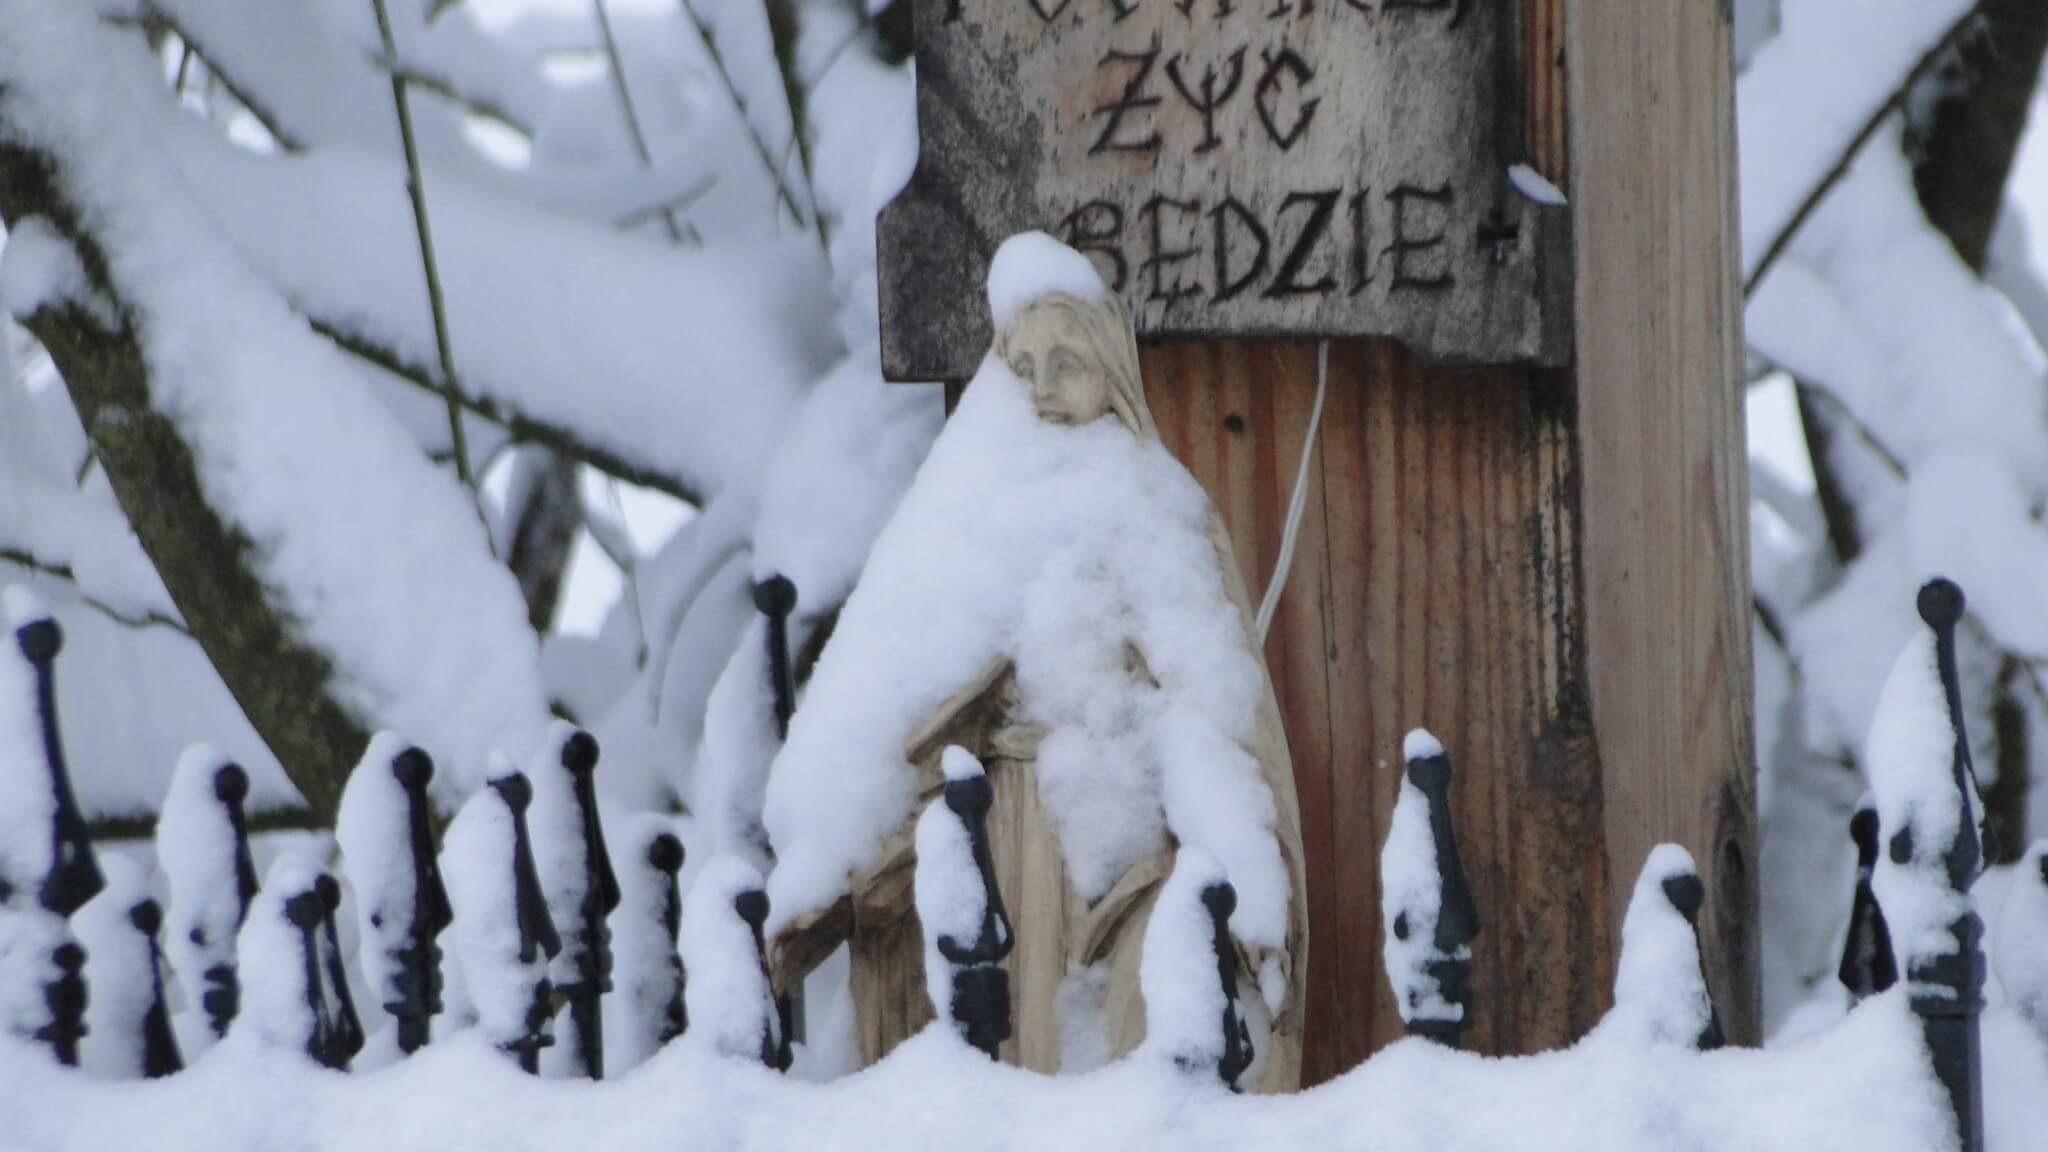 Lutowa zima - śnieżna i mroźna 2